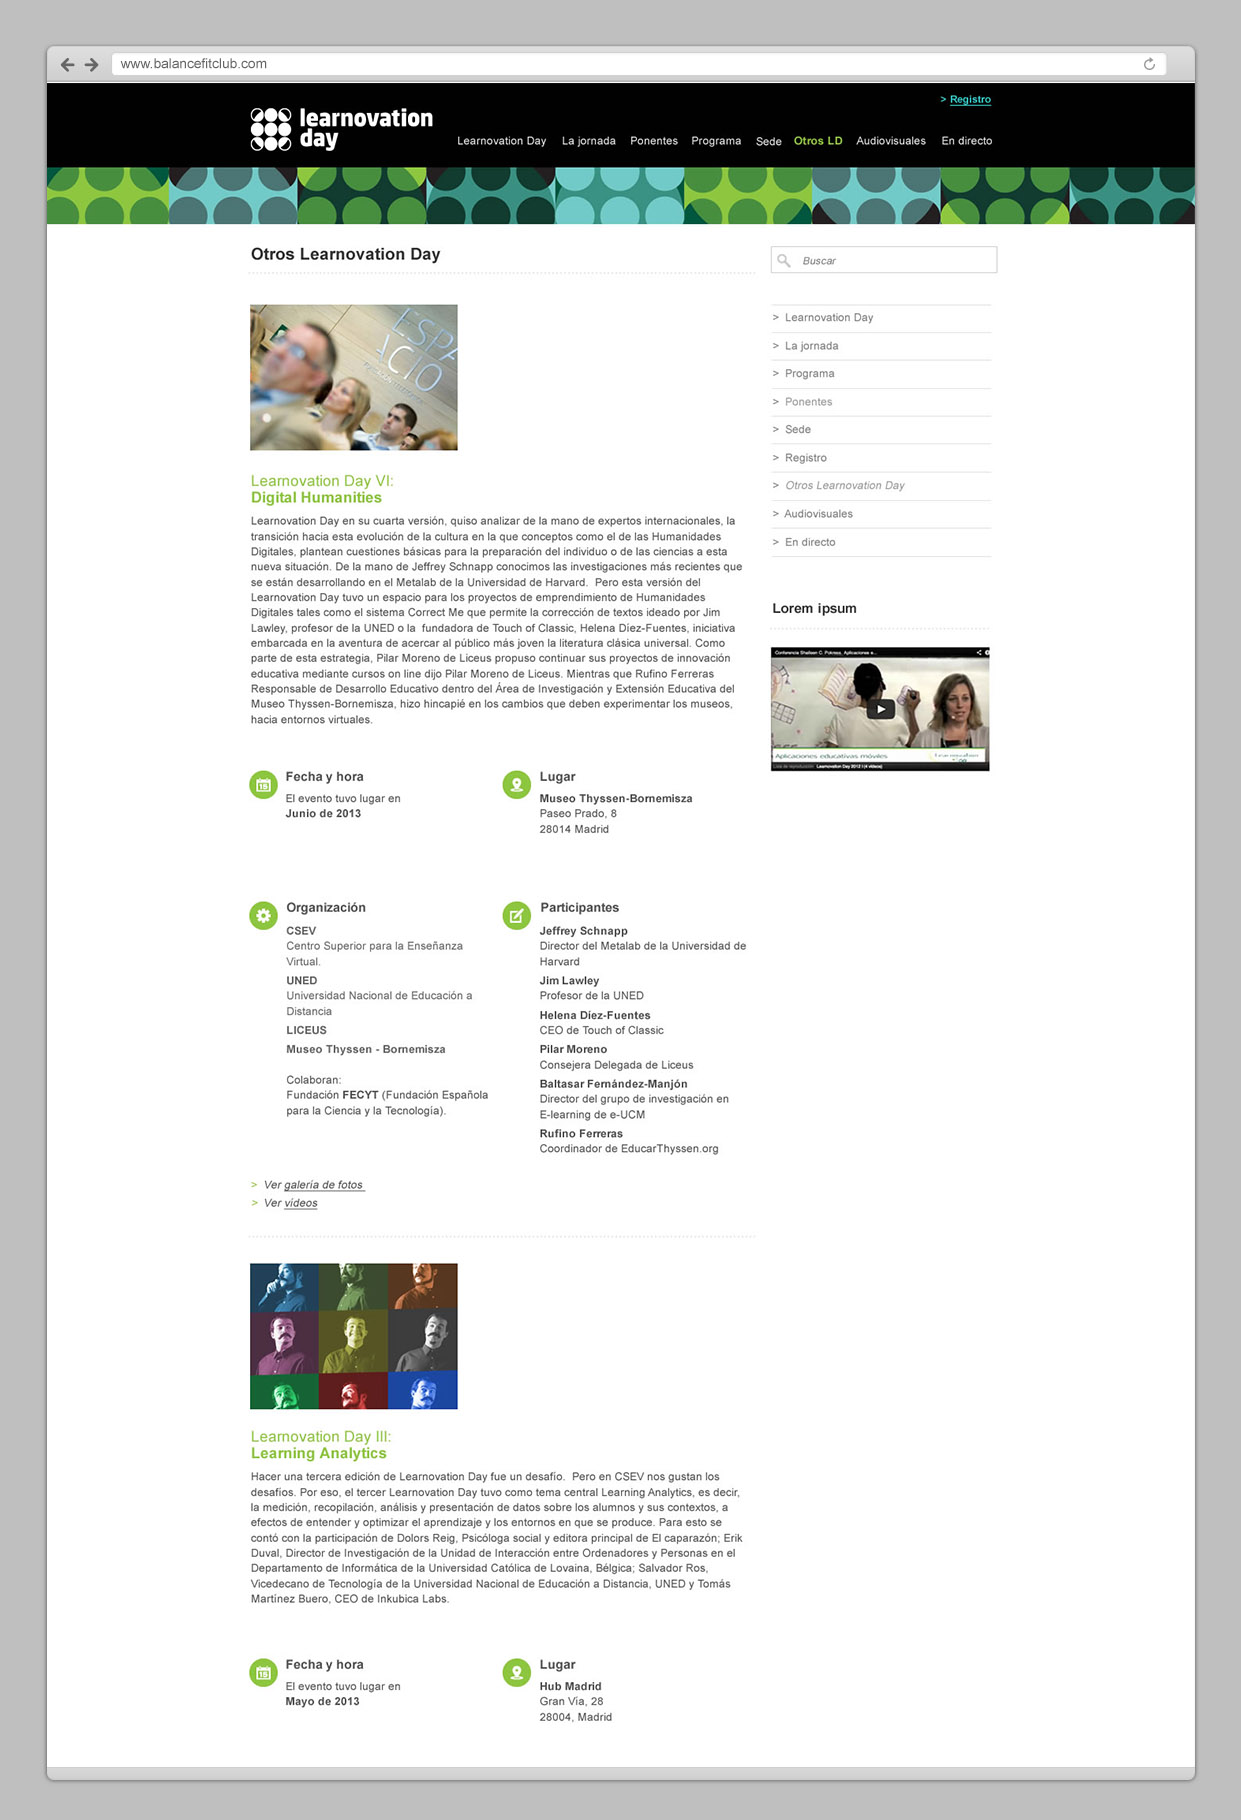 learnovationday_web_02.jpg